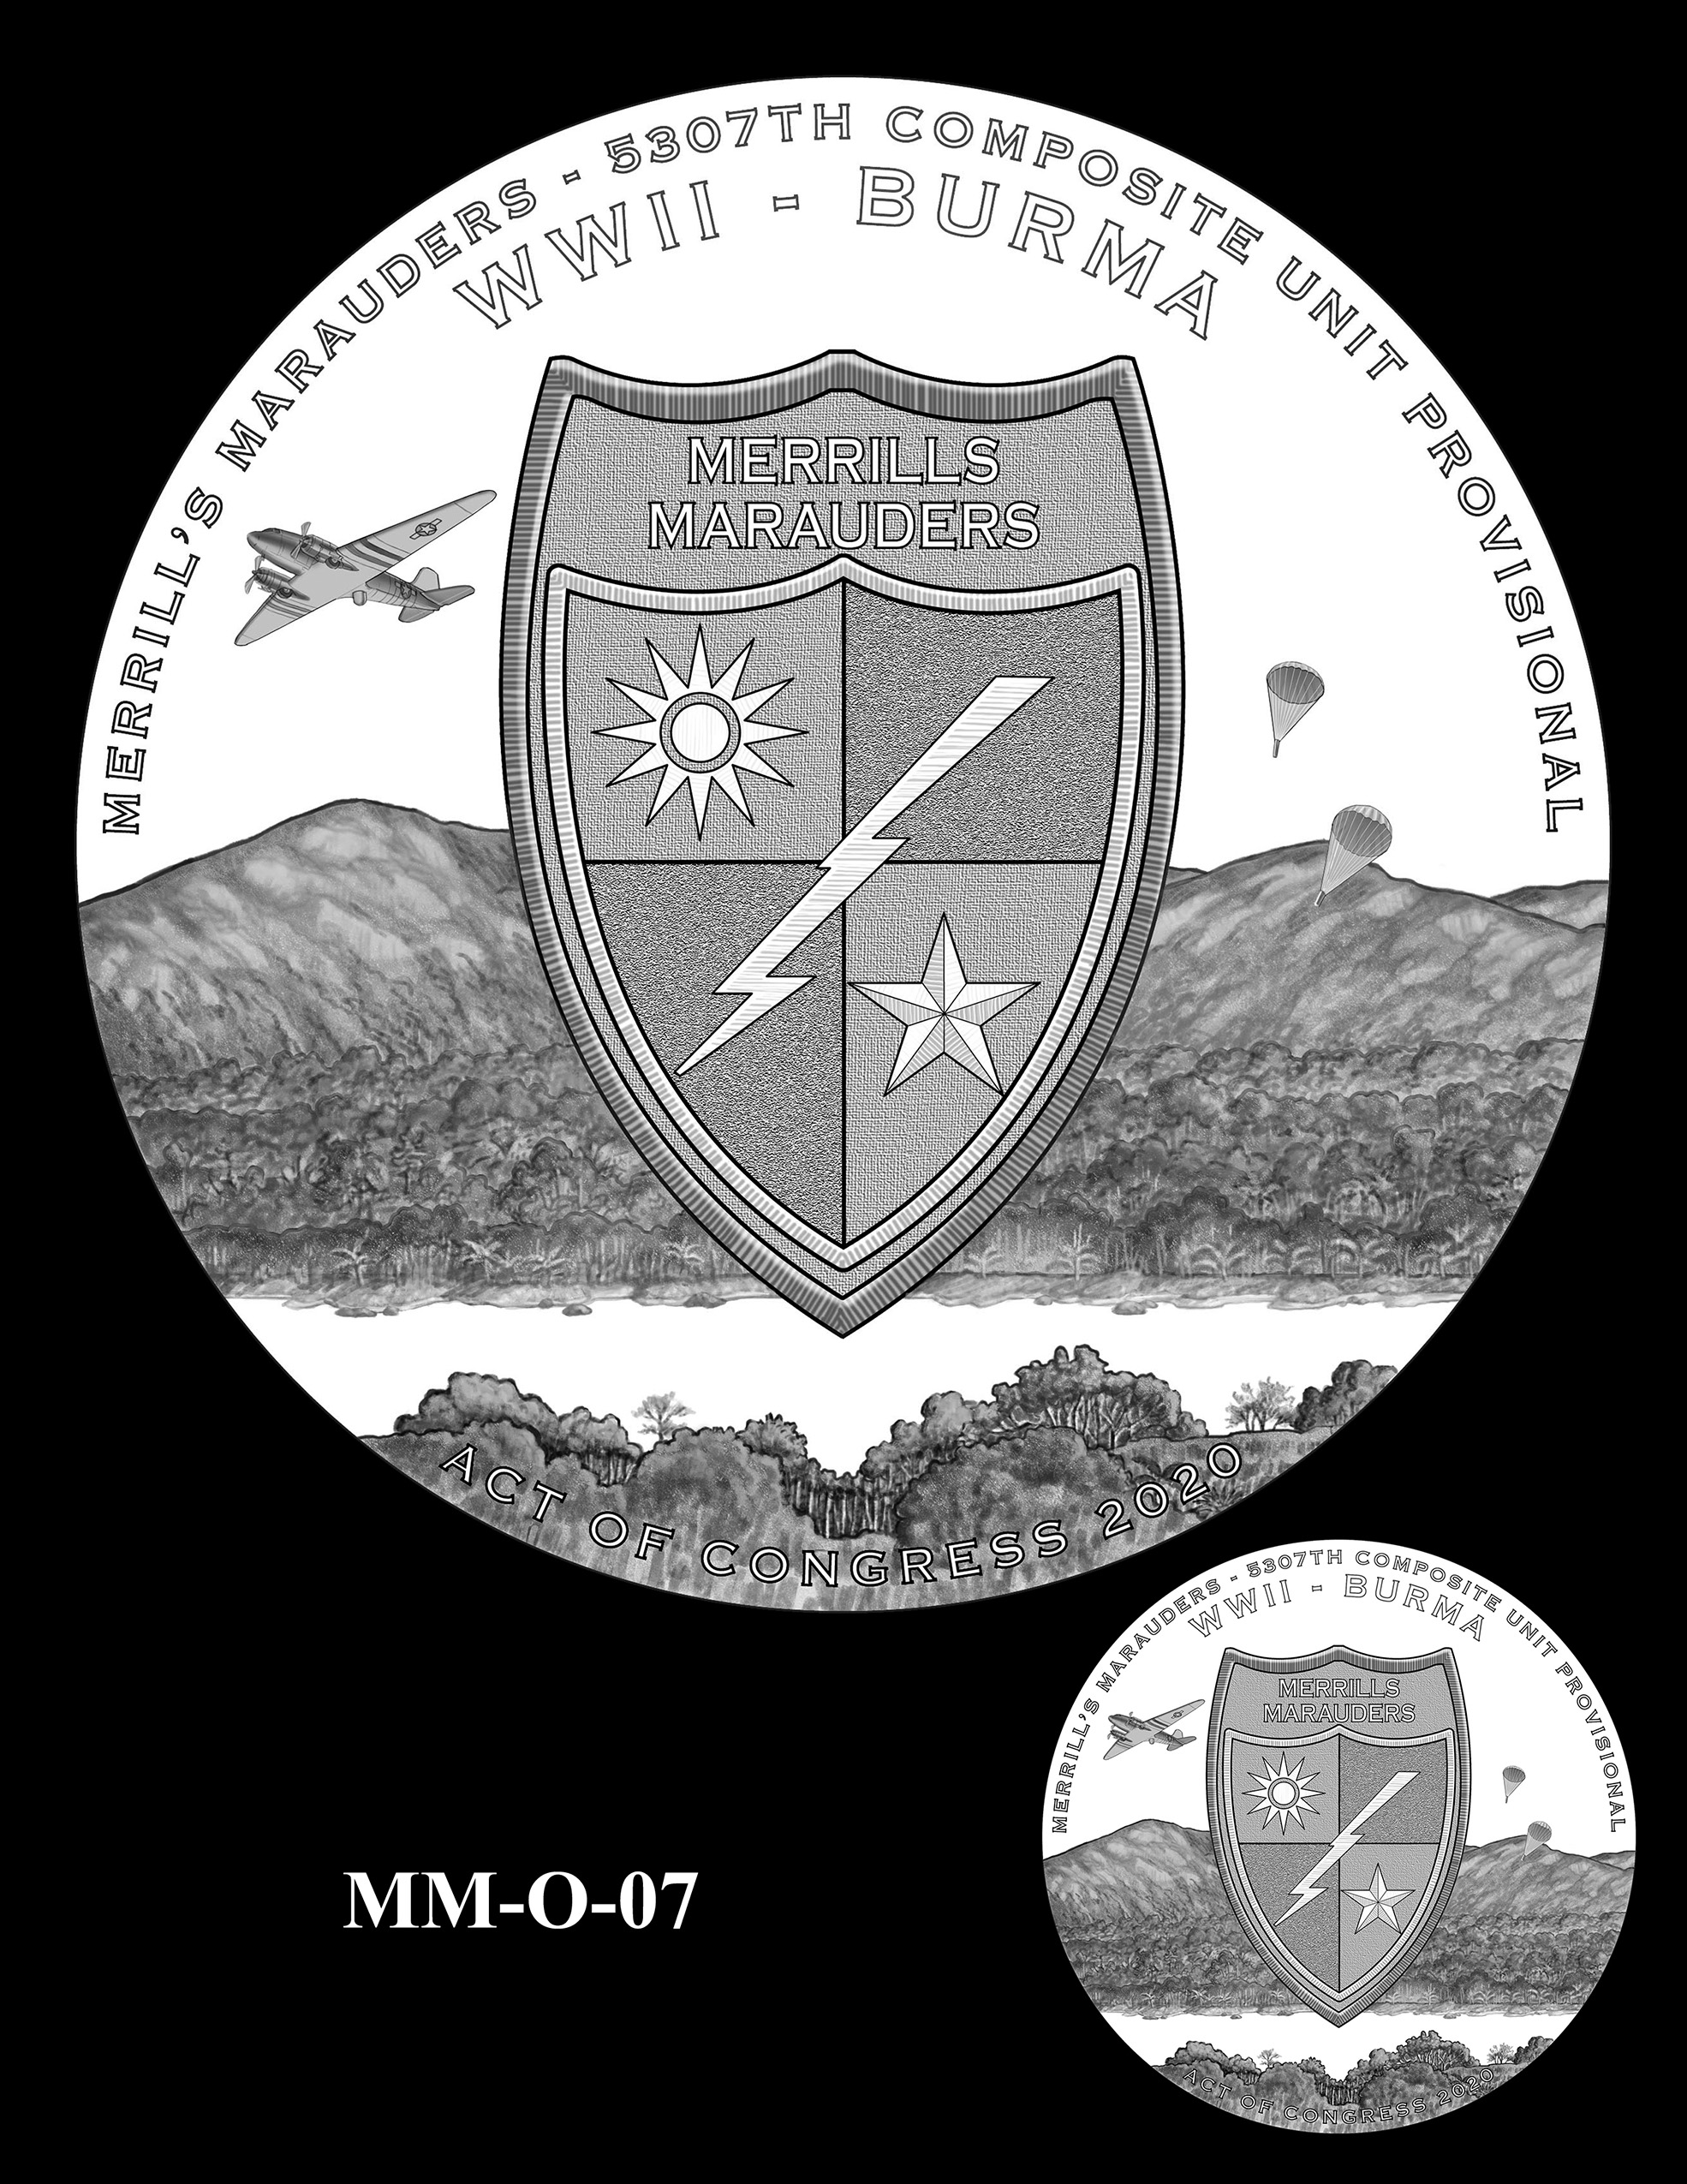 MM-O-07 -- Merrill's Marauders Congressional Gold Medal